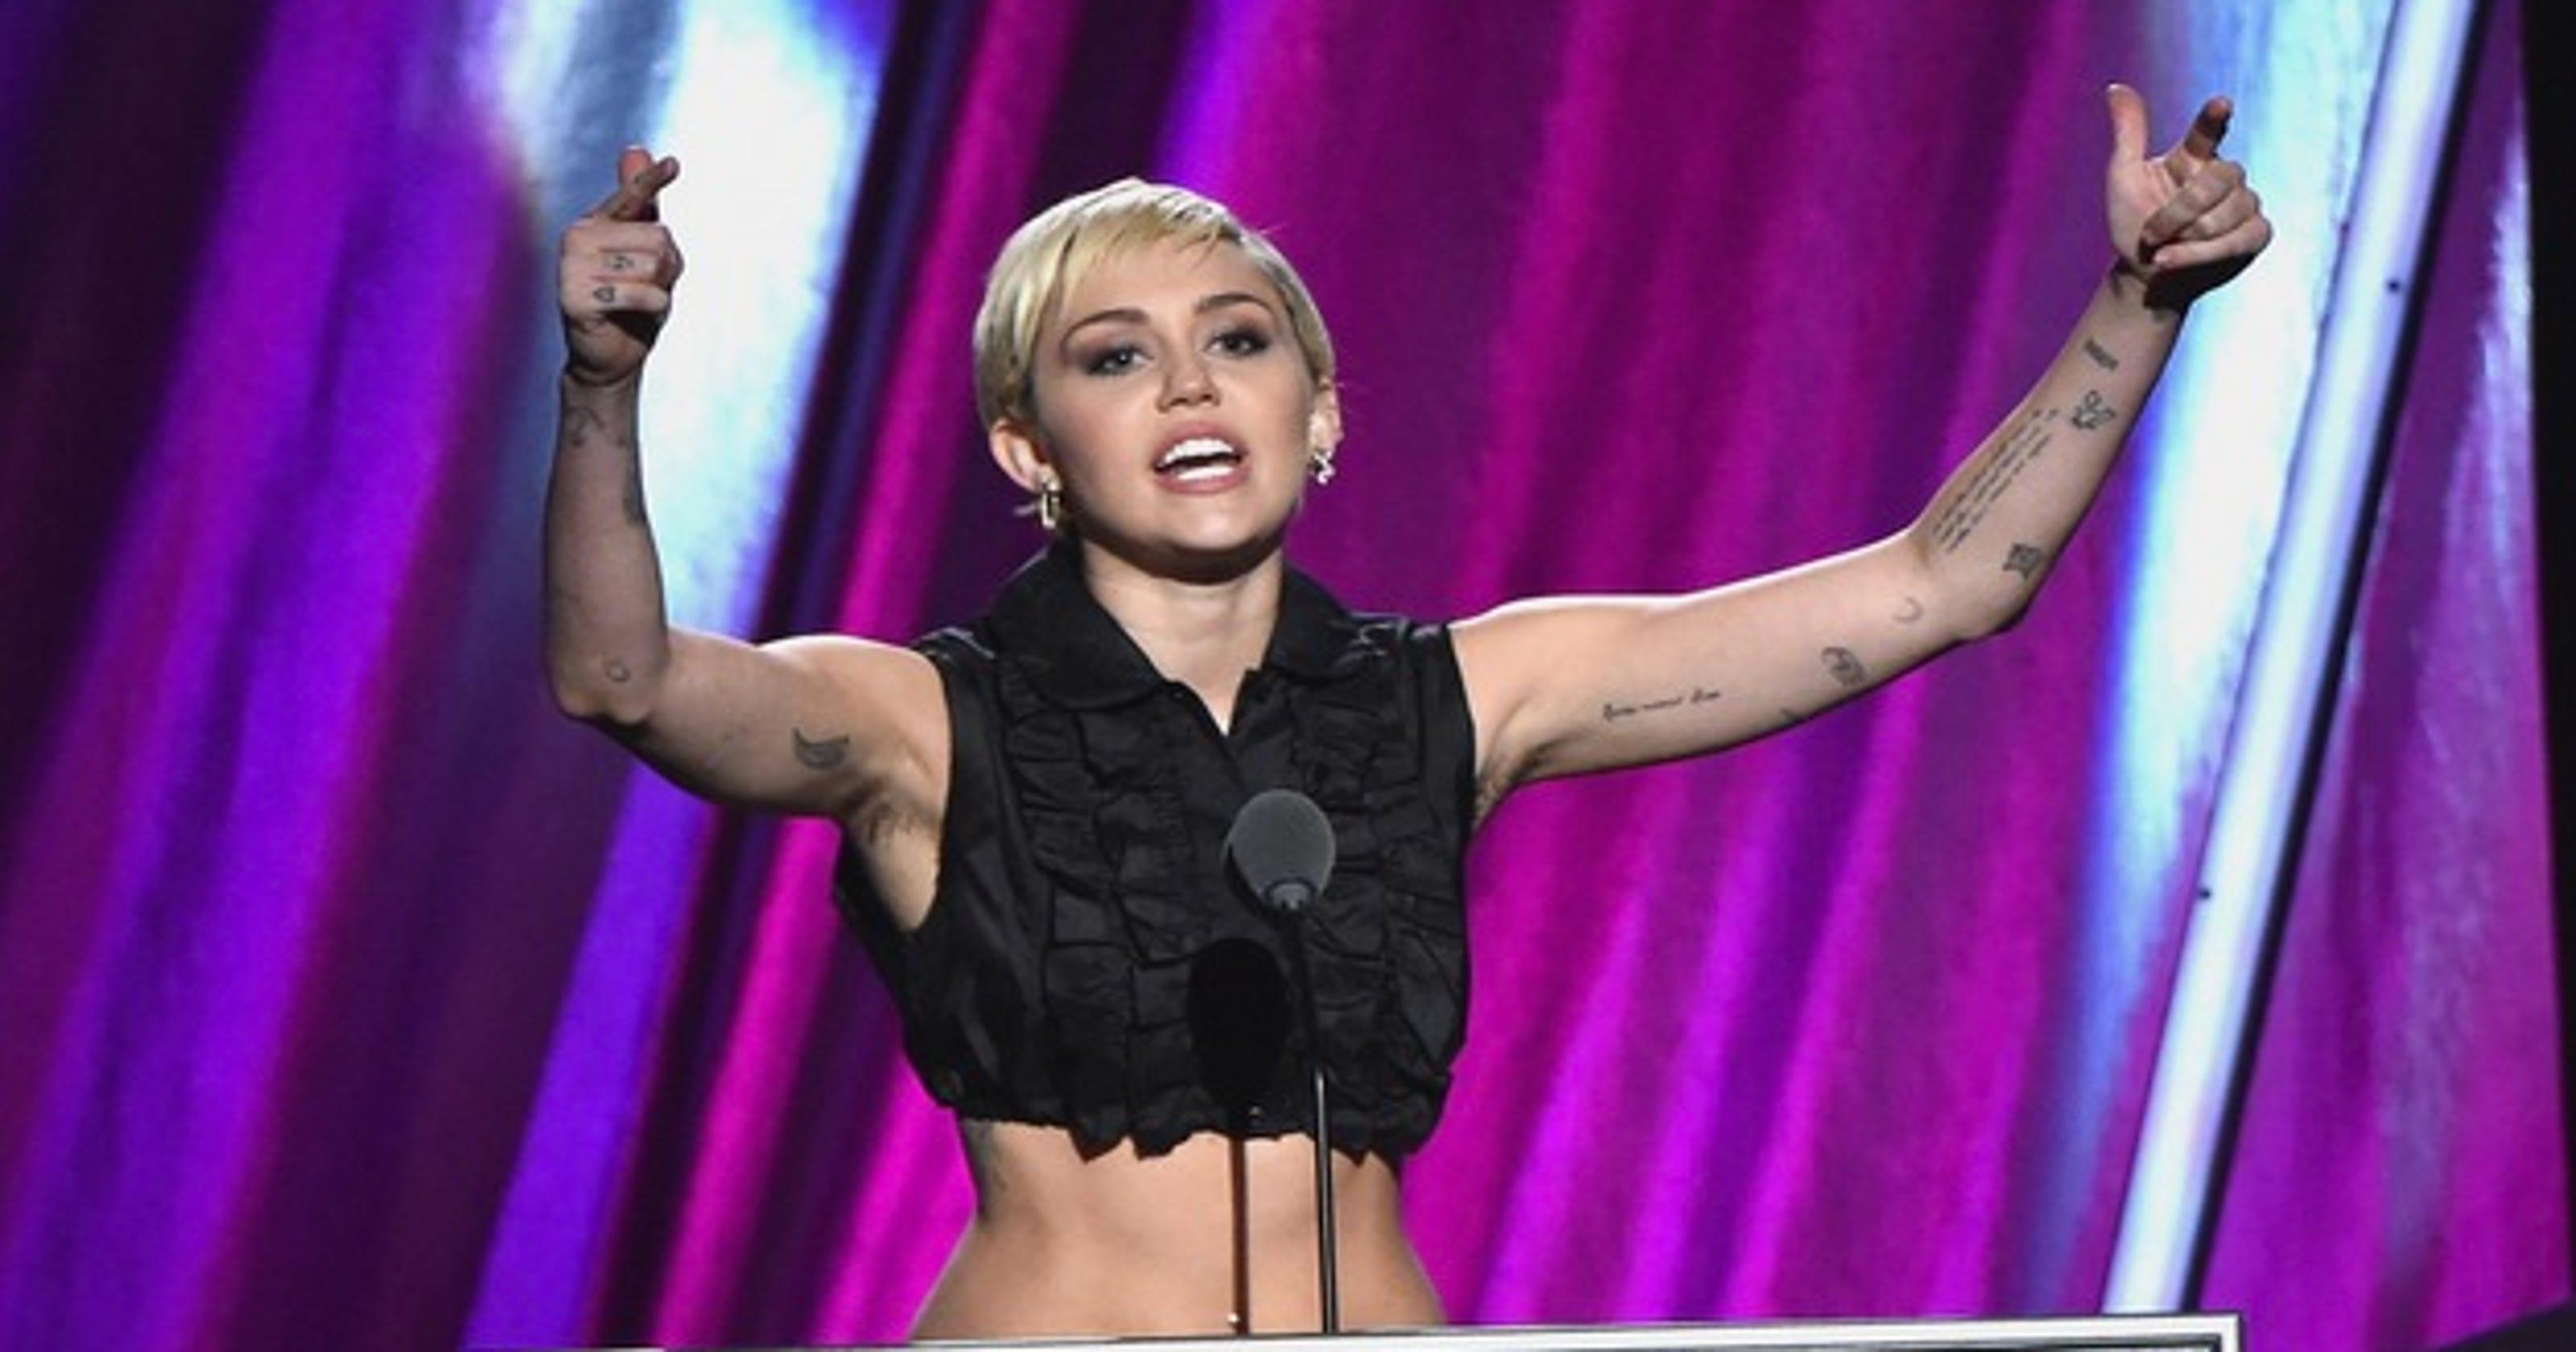 Miley Cyrus Long Armpit Hair Raises Eyebrows